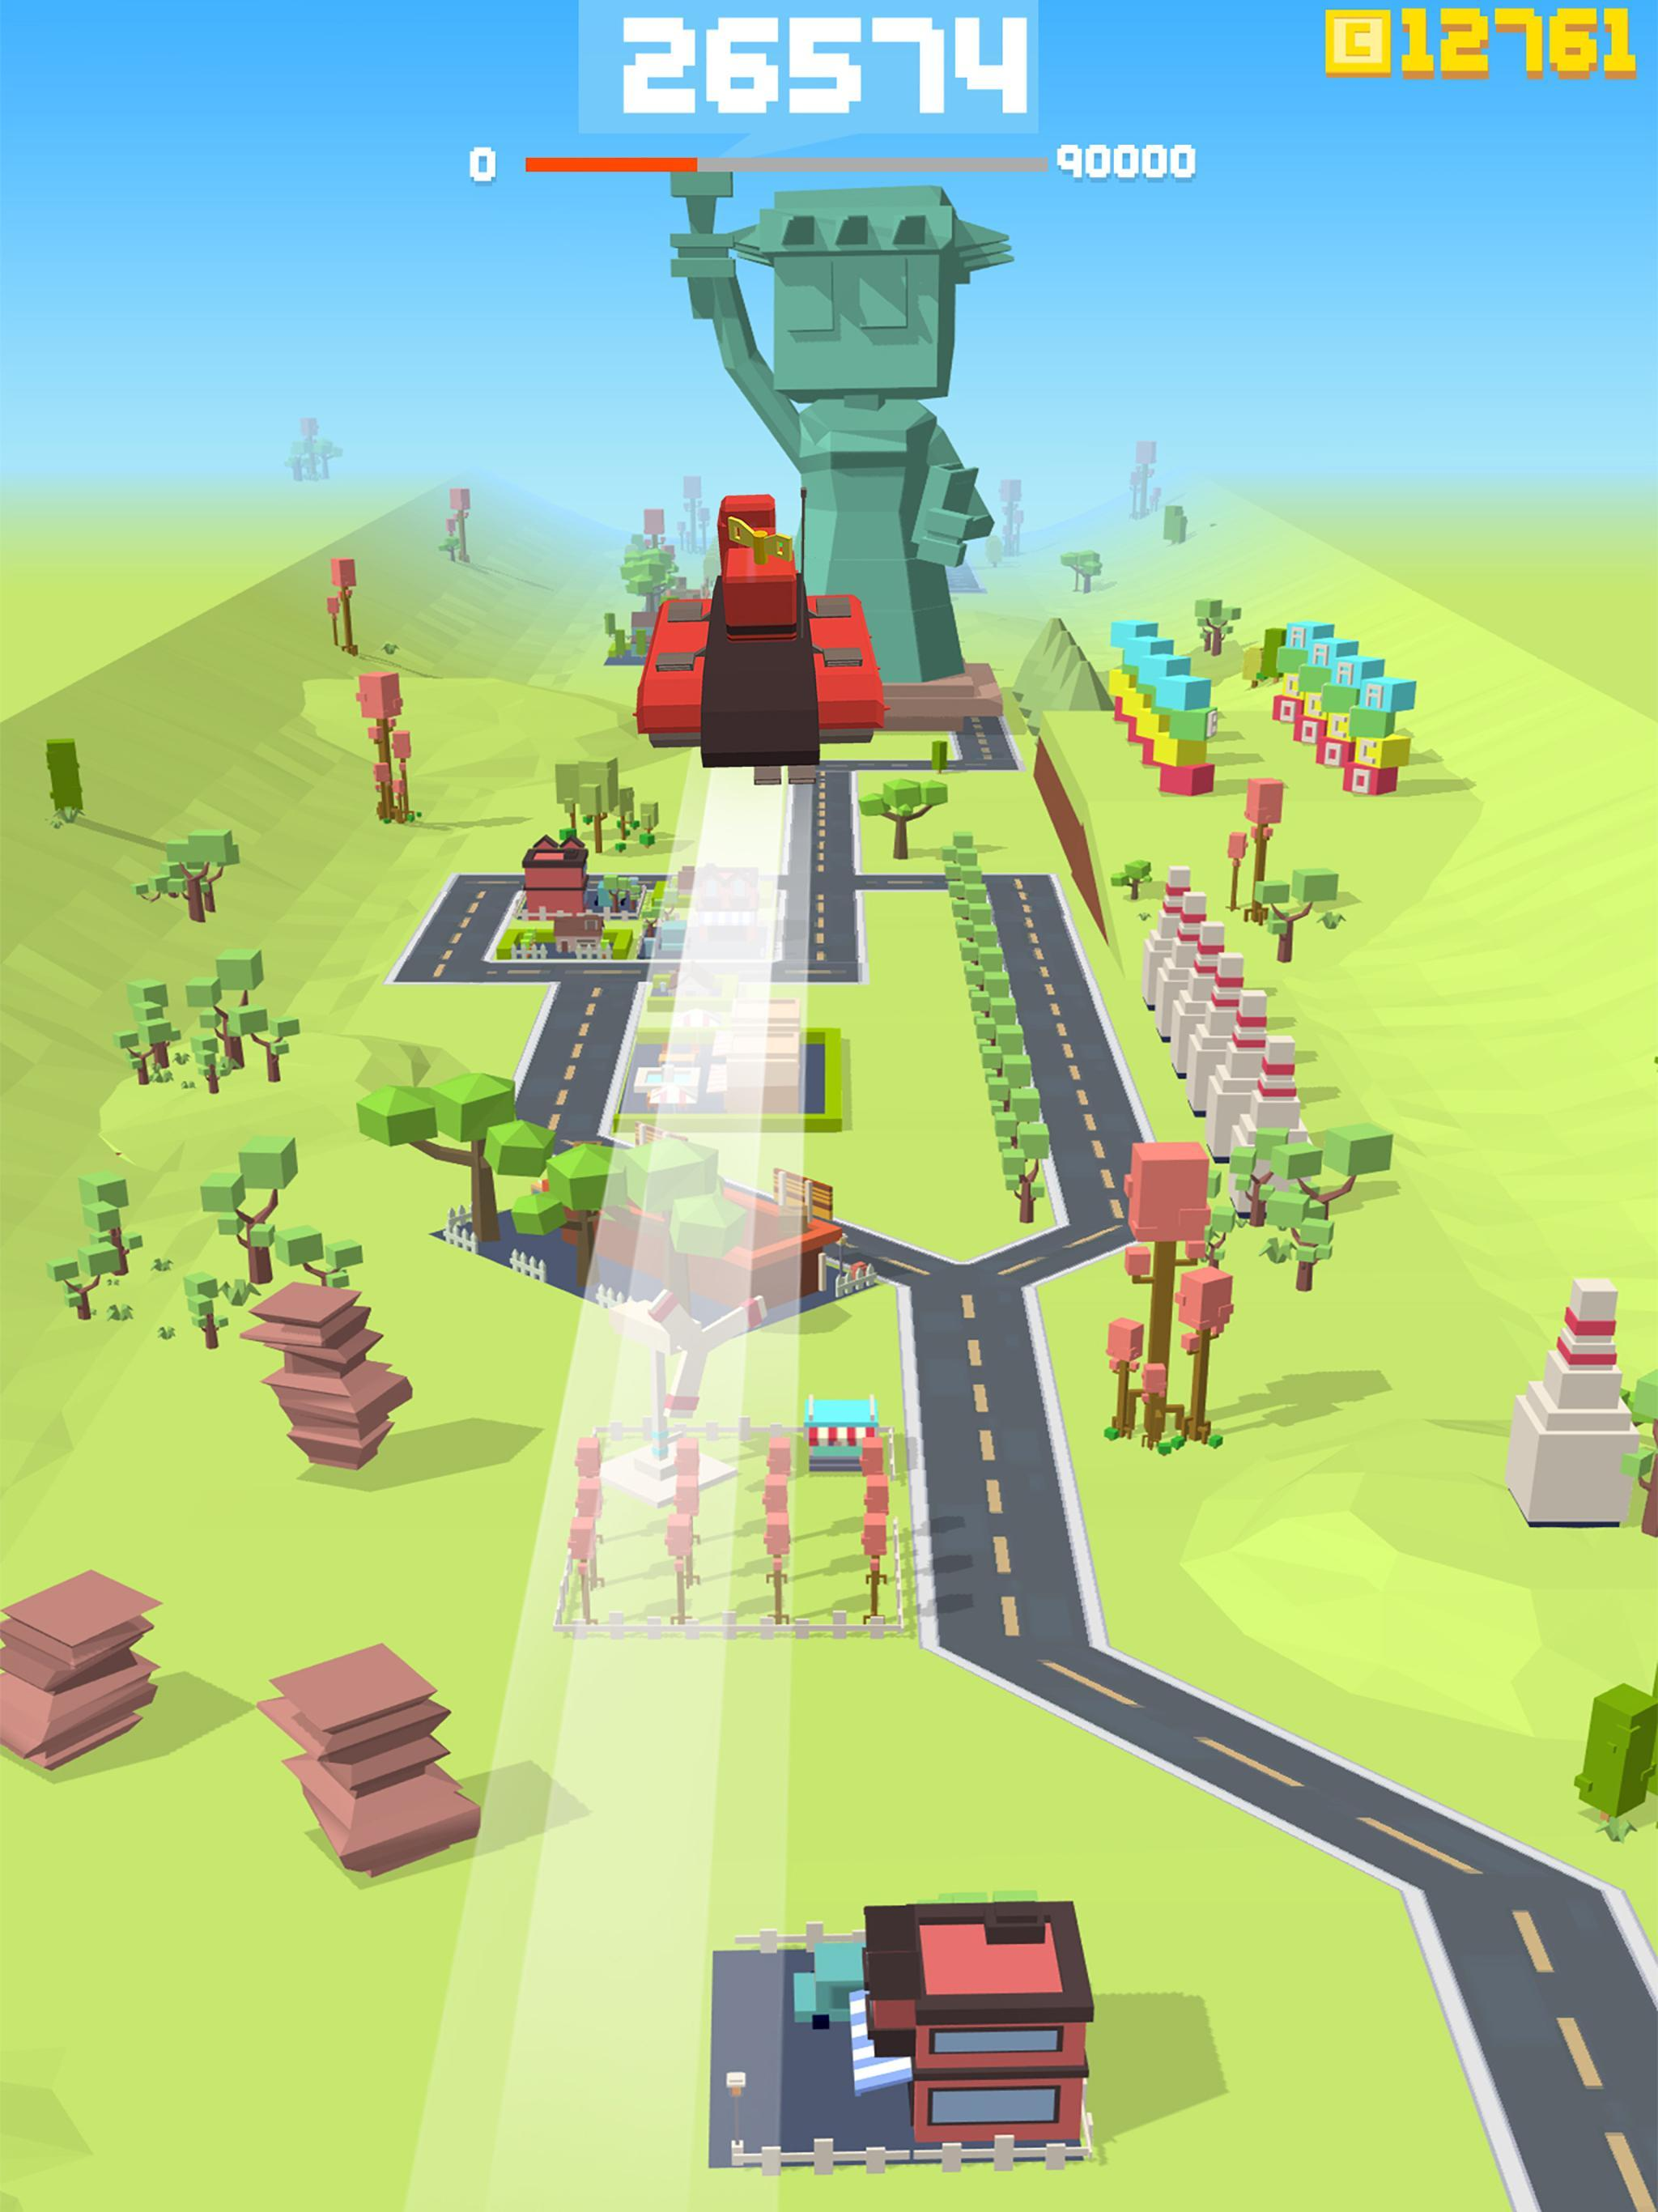 Advance Bravely 1.3.0 Screenshot 7